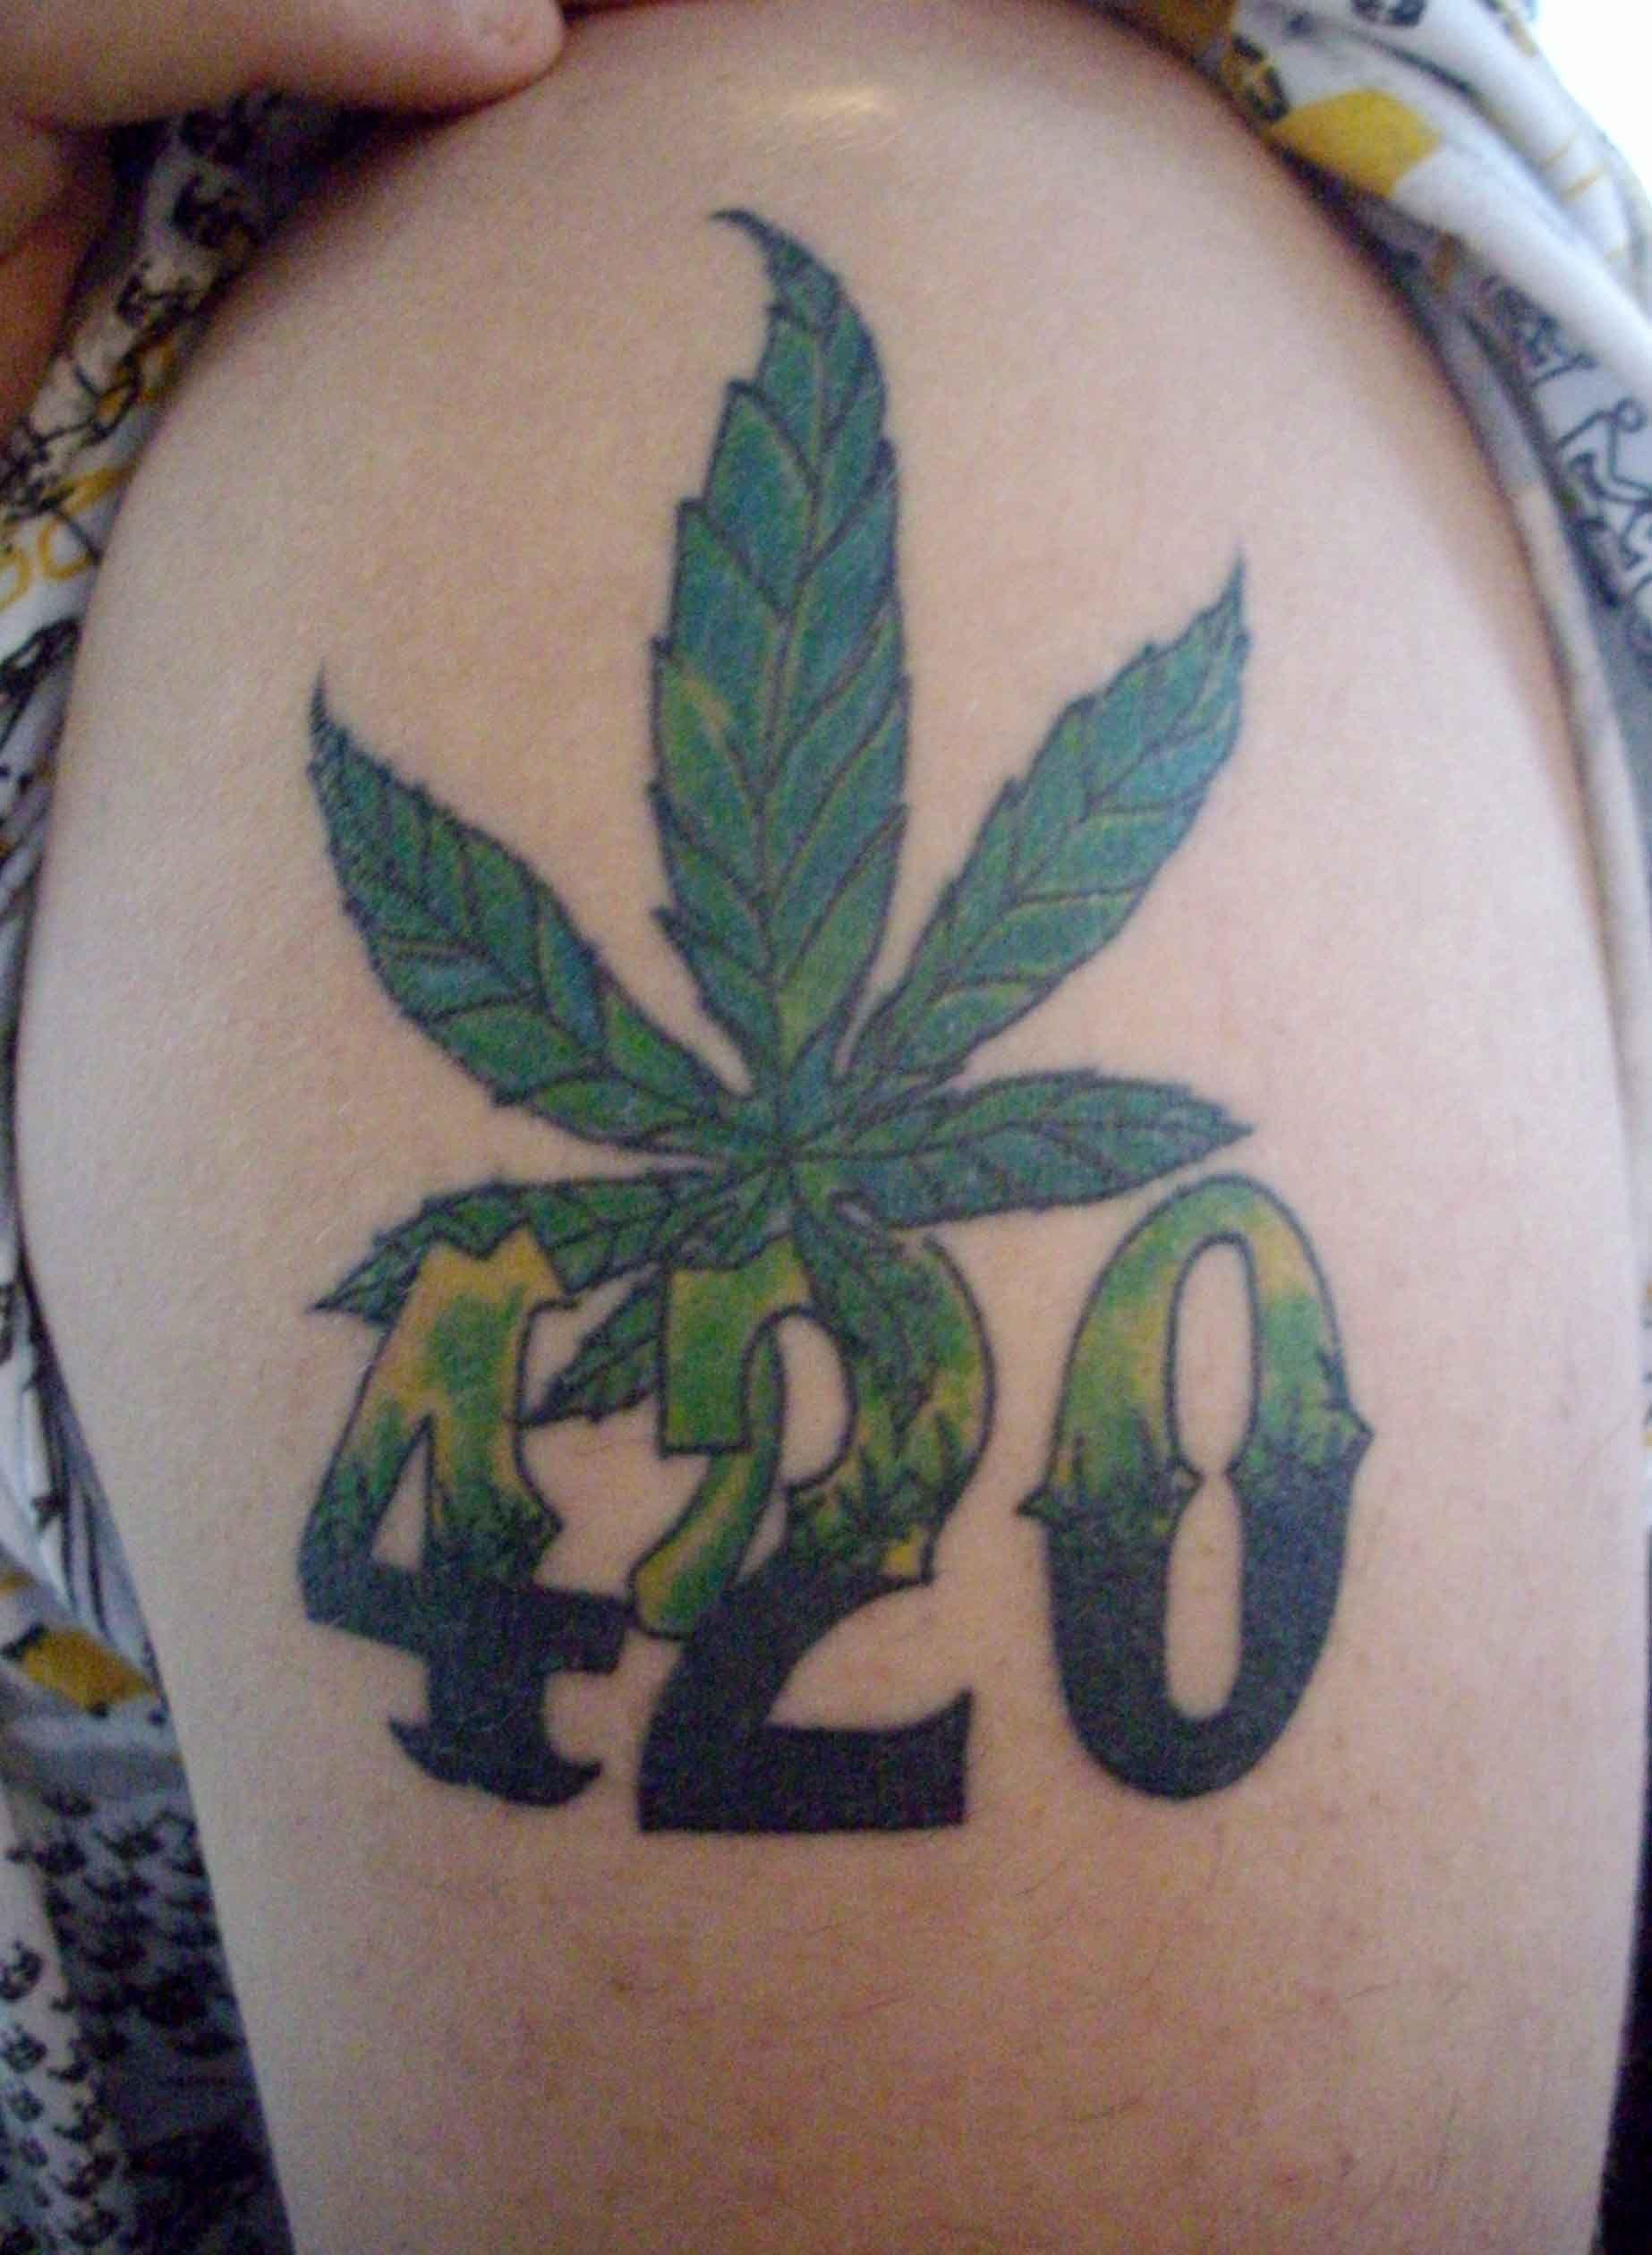 420 Tattoos 301 Moved Permanently | 420 tattoo, Tattoos ...